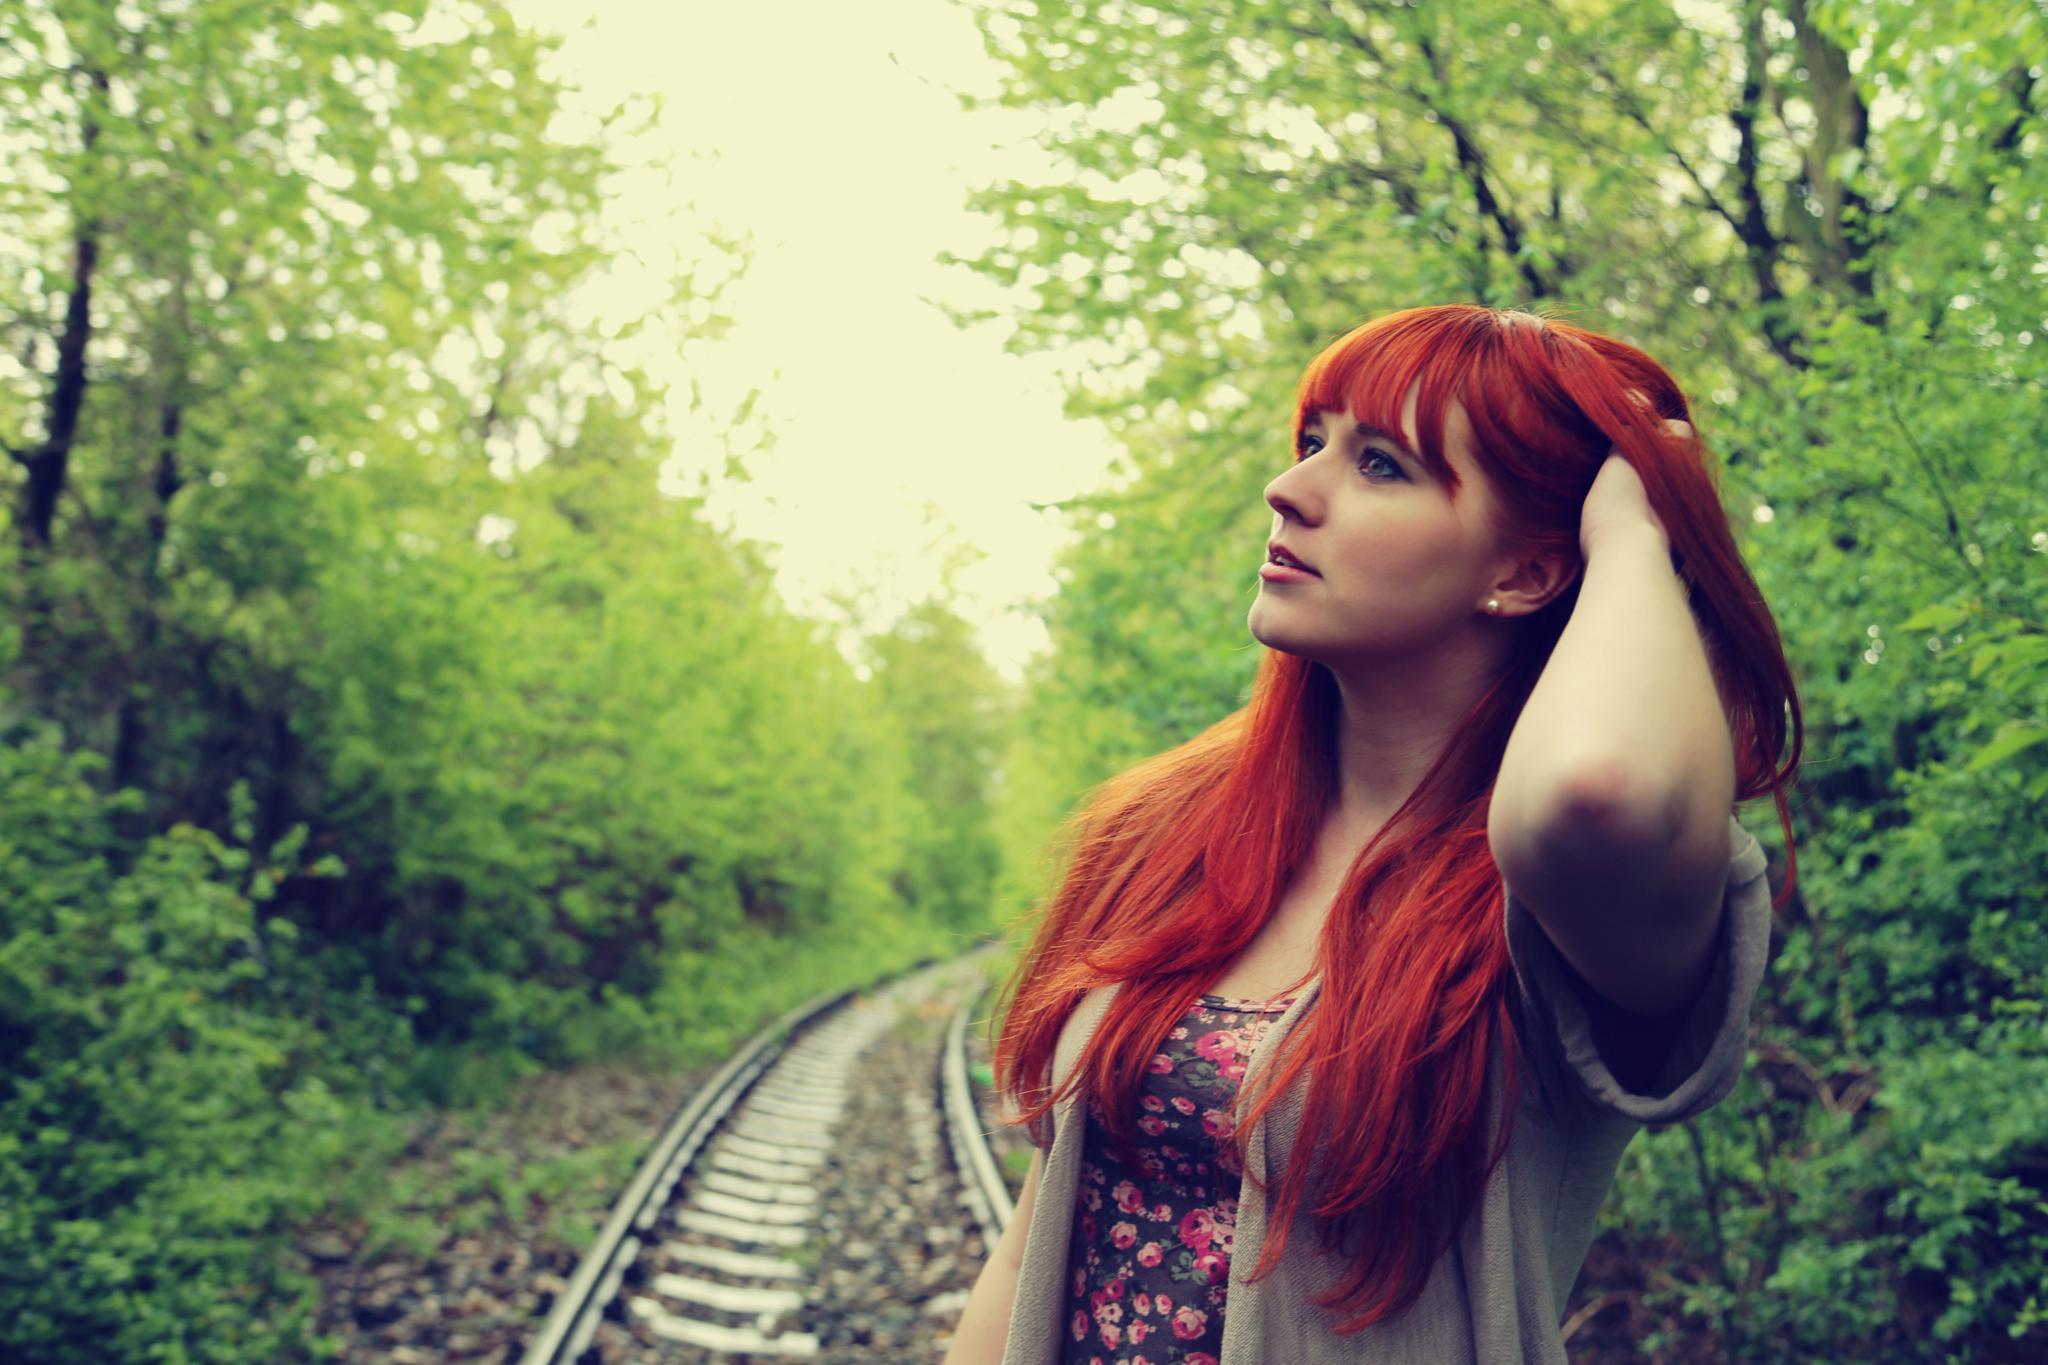 Lovely redhead by jaroslavakurilcova